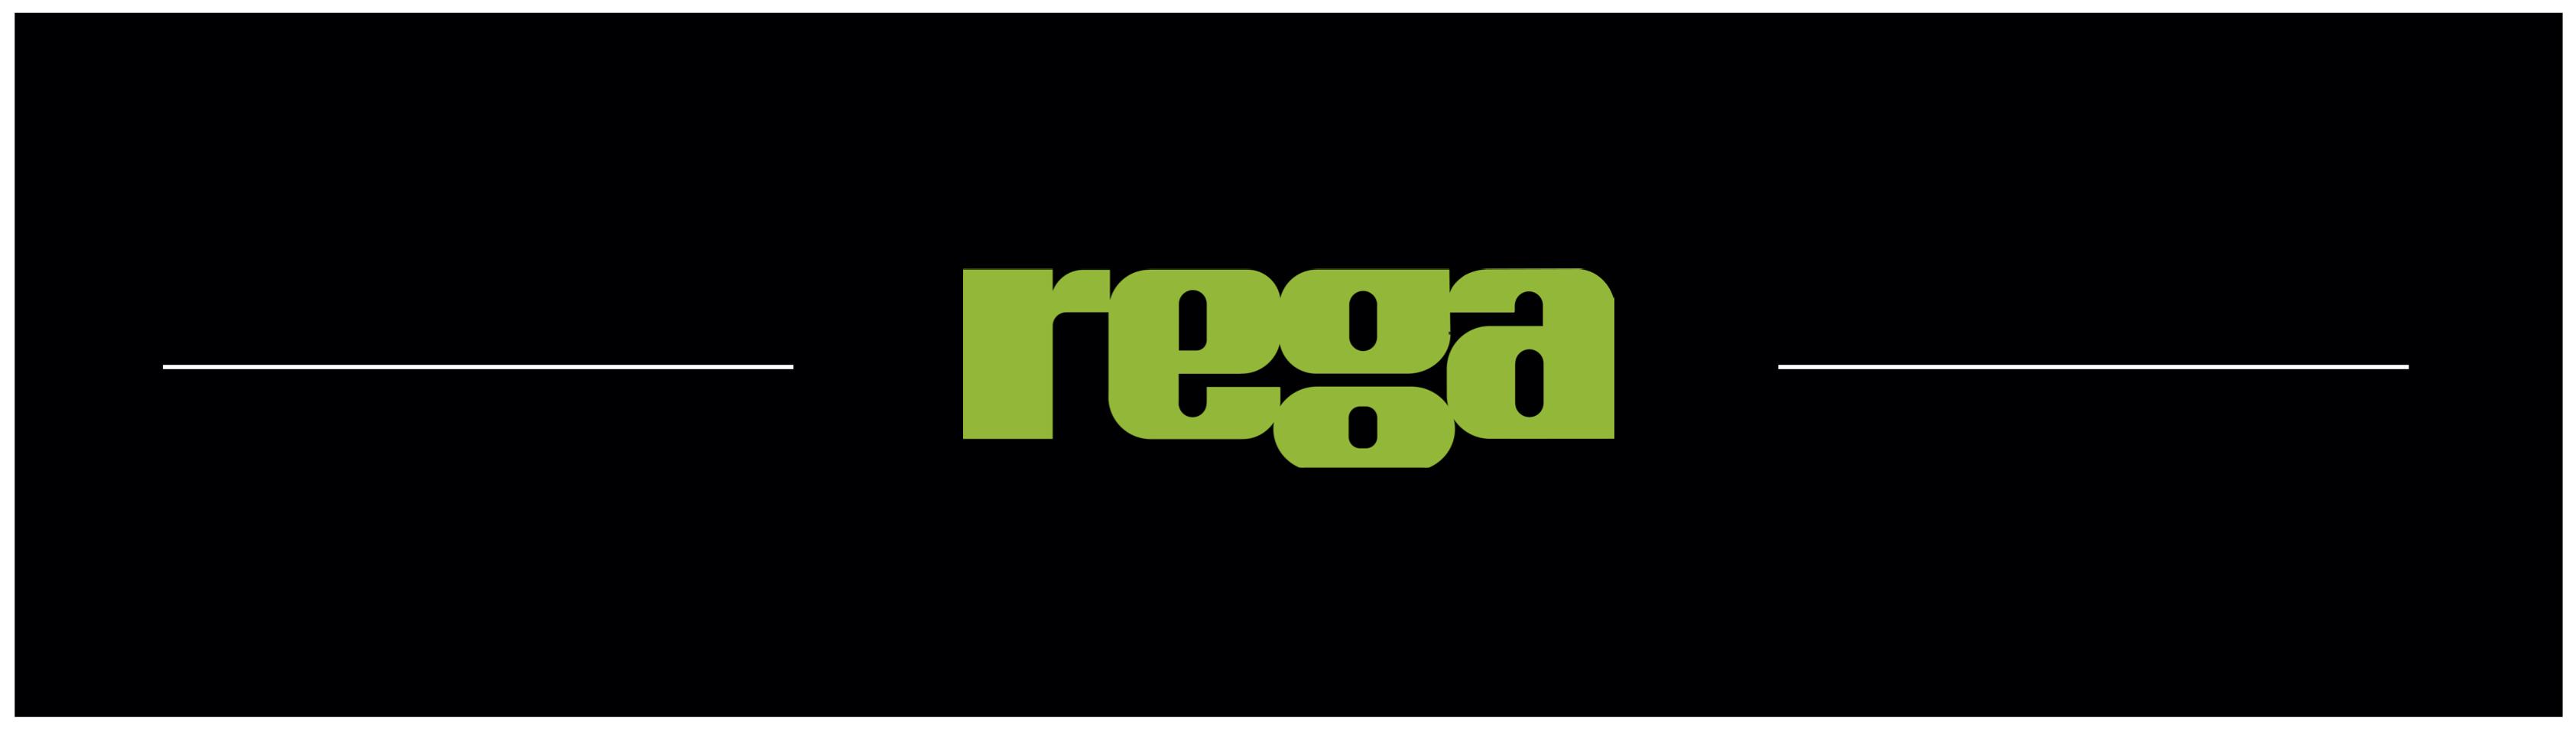 rega-logo-1.jpg